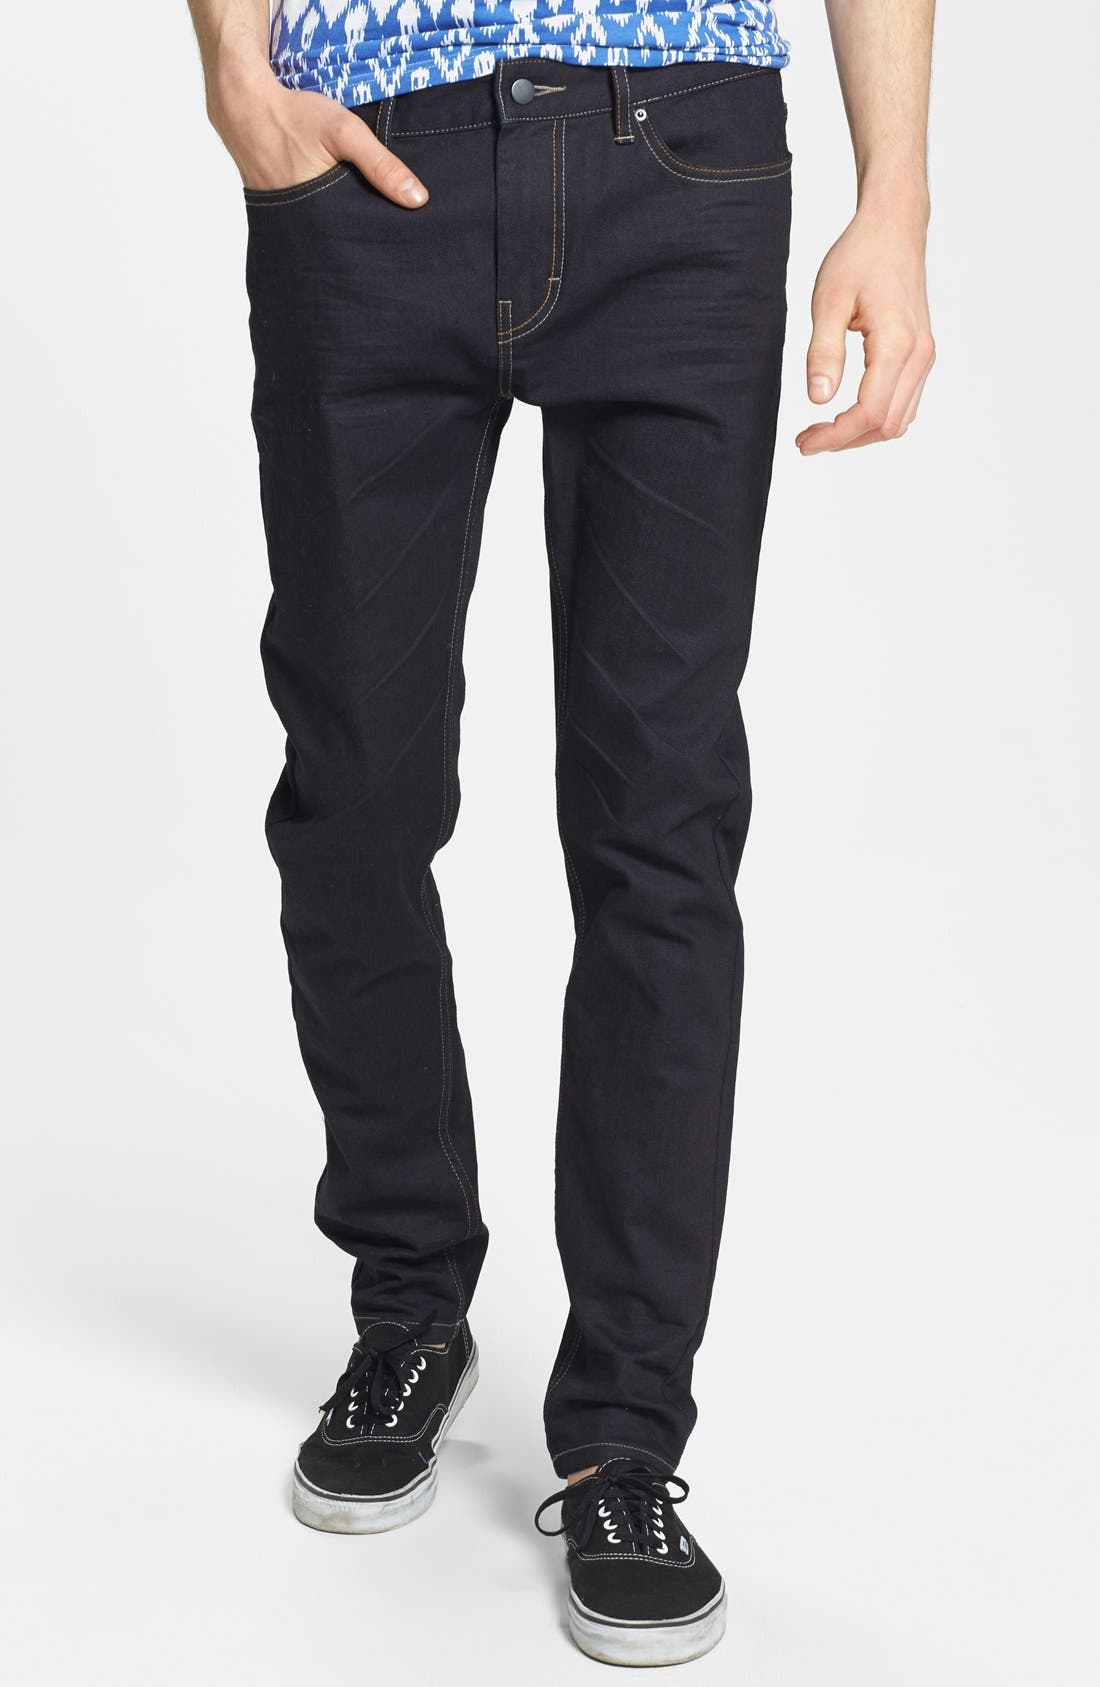 Alternate Image 1 Selected - Topman Coated Stretch Skinny Fit Jeans (Dark Blue)